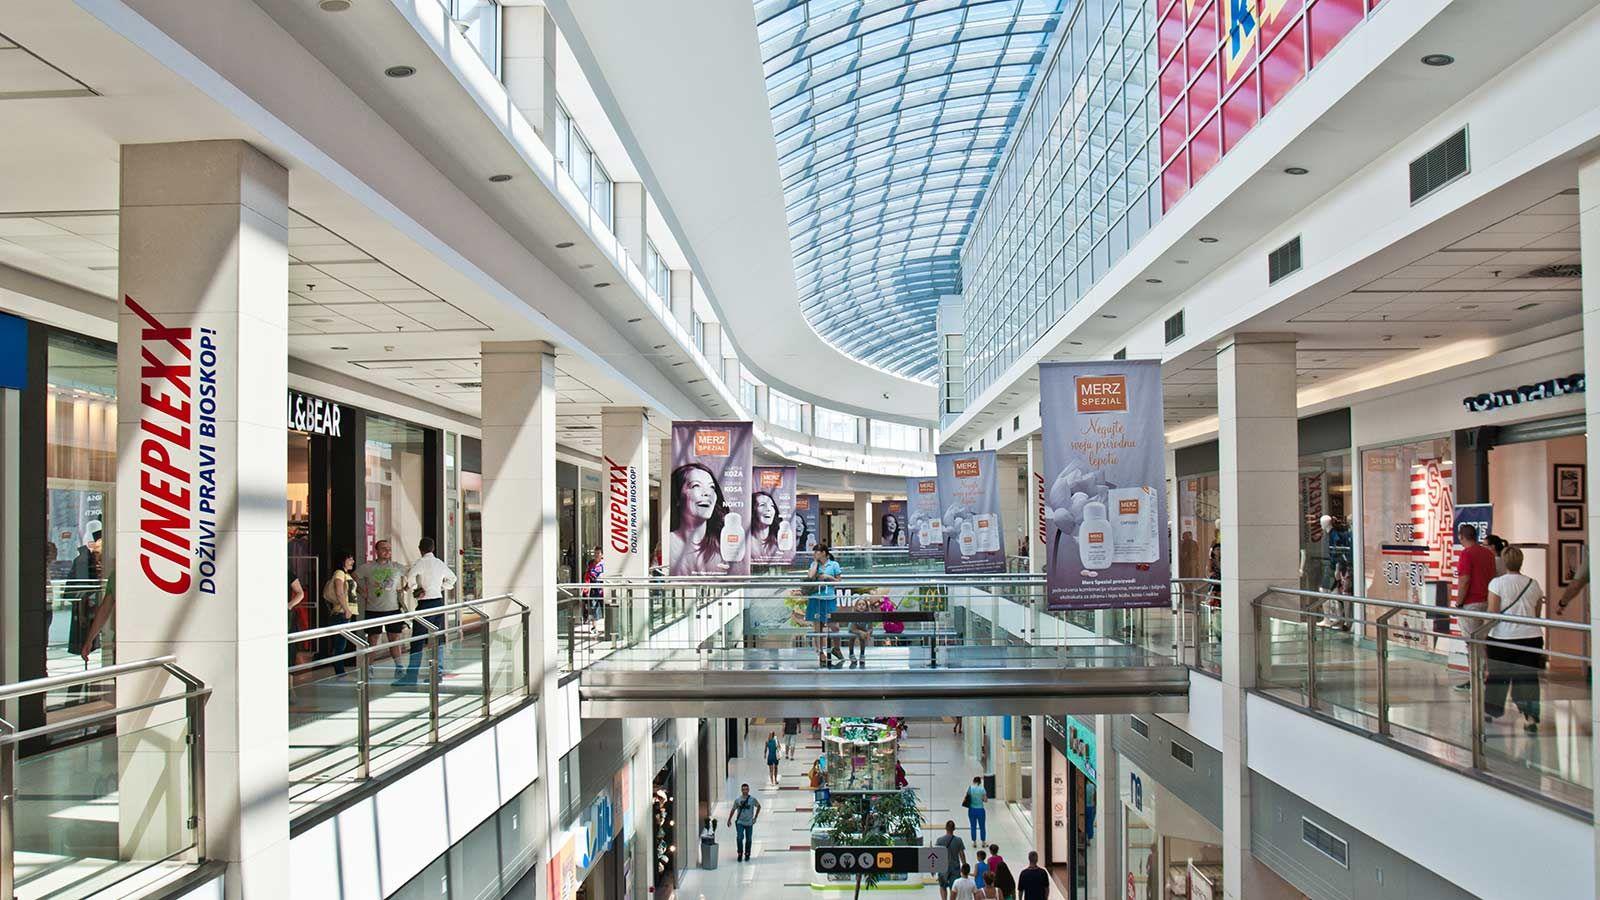 Delta City Belgrade Building Interior Shops - Mace Group